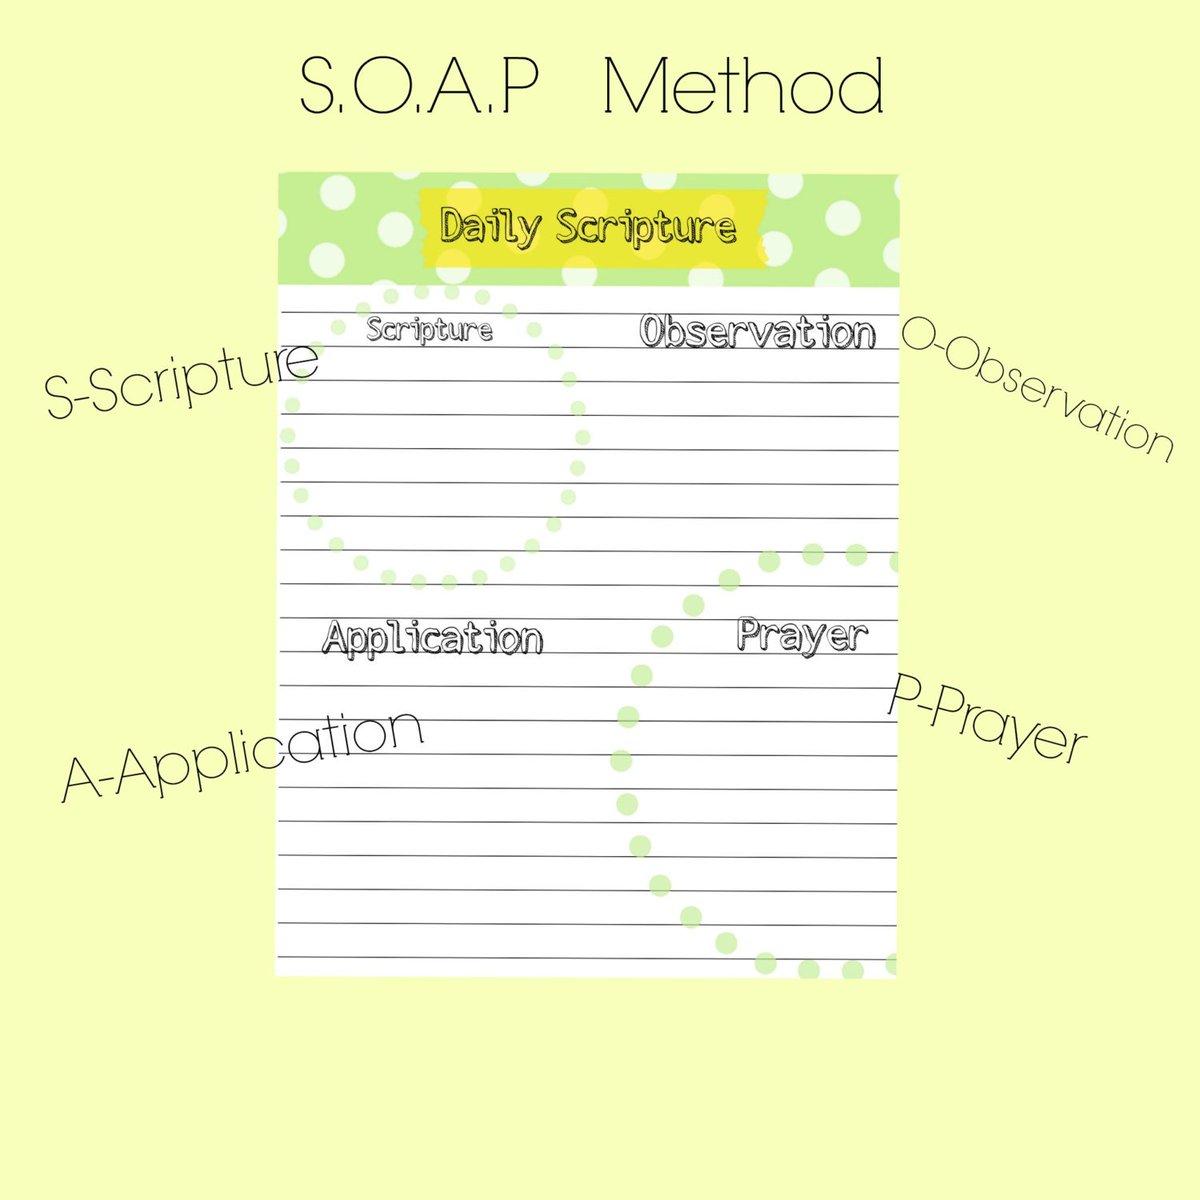 photo about Soap Bible Study Printable titled soapmethod hashtag upon Twitter